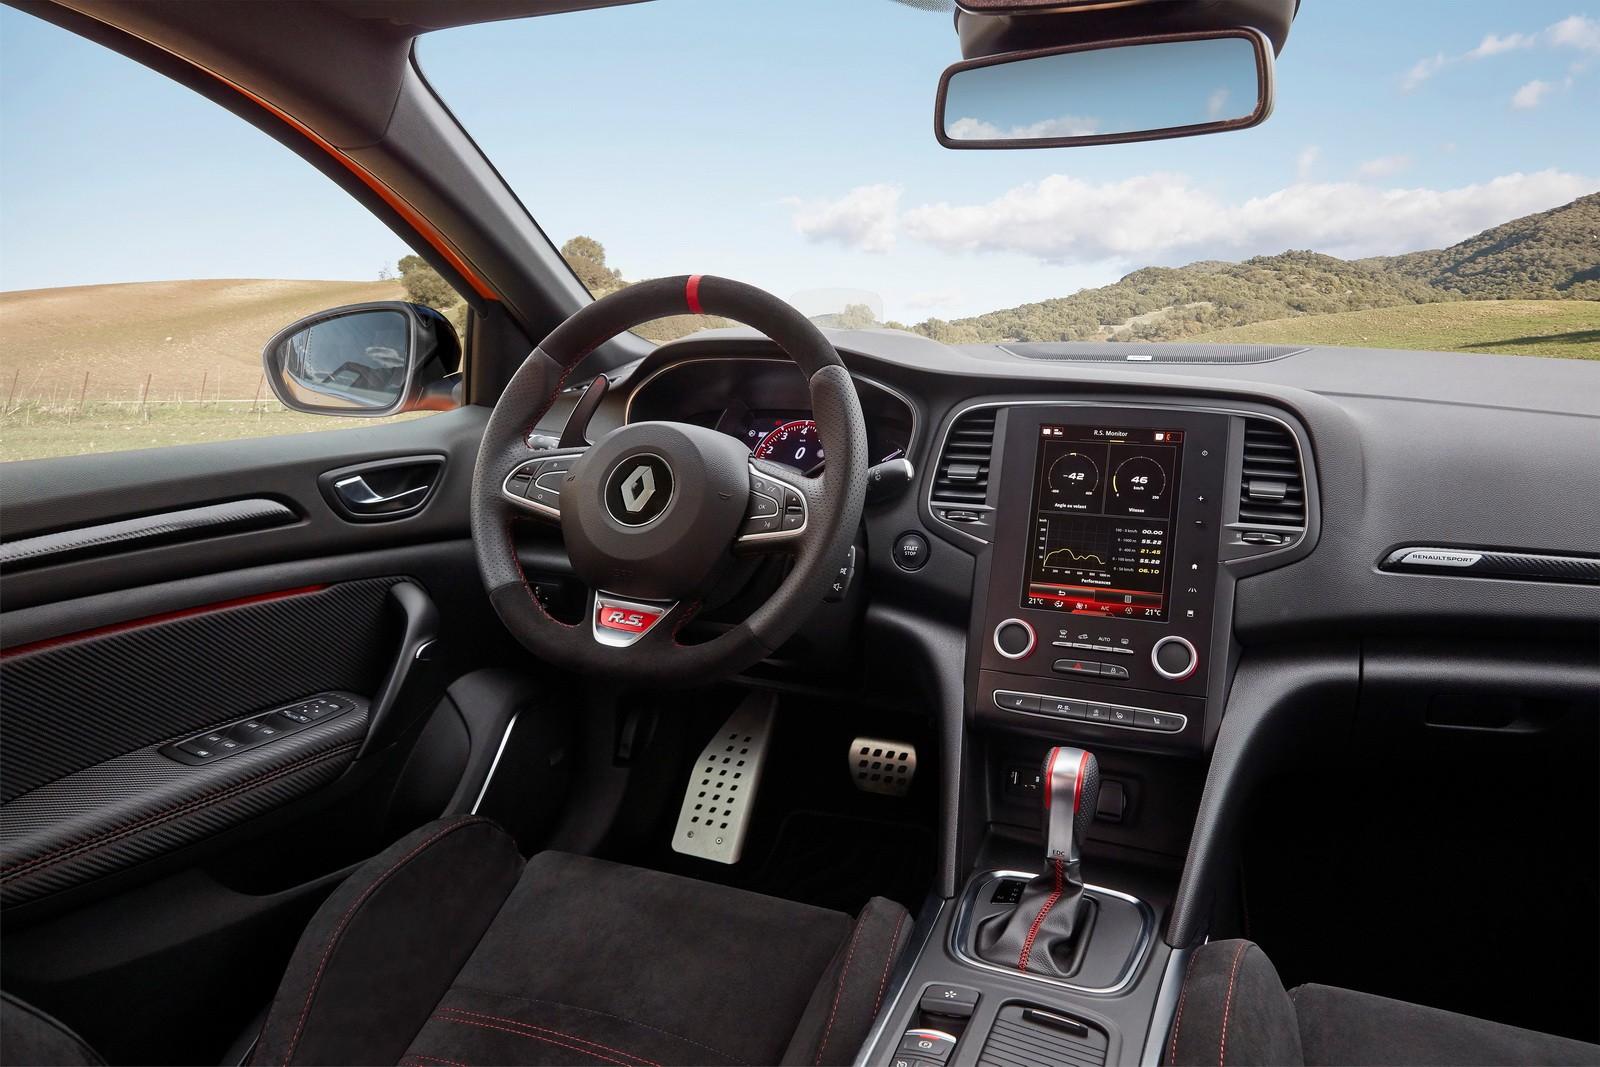 2018 Renault Megane RS Showcases Acceleration With Digital Dash